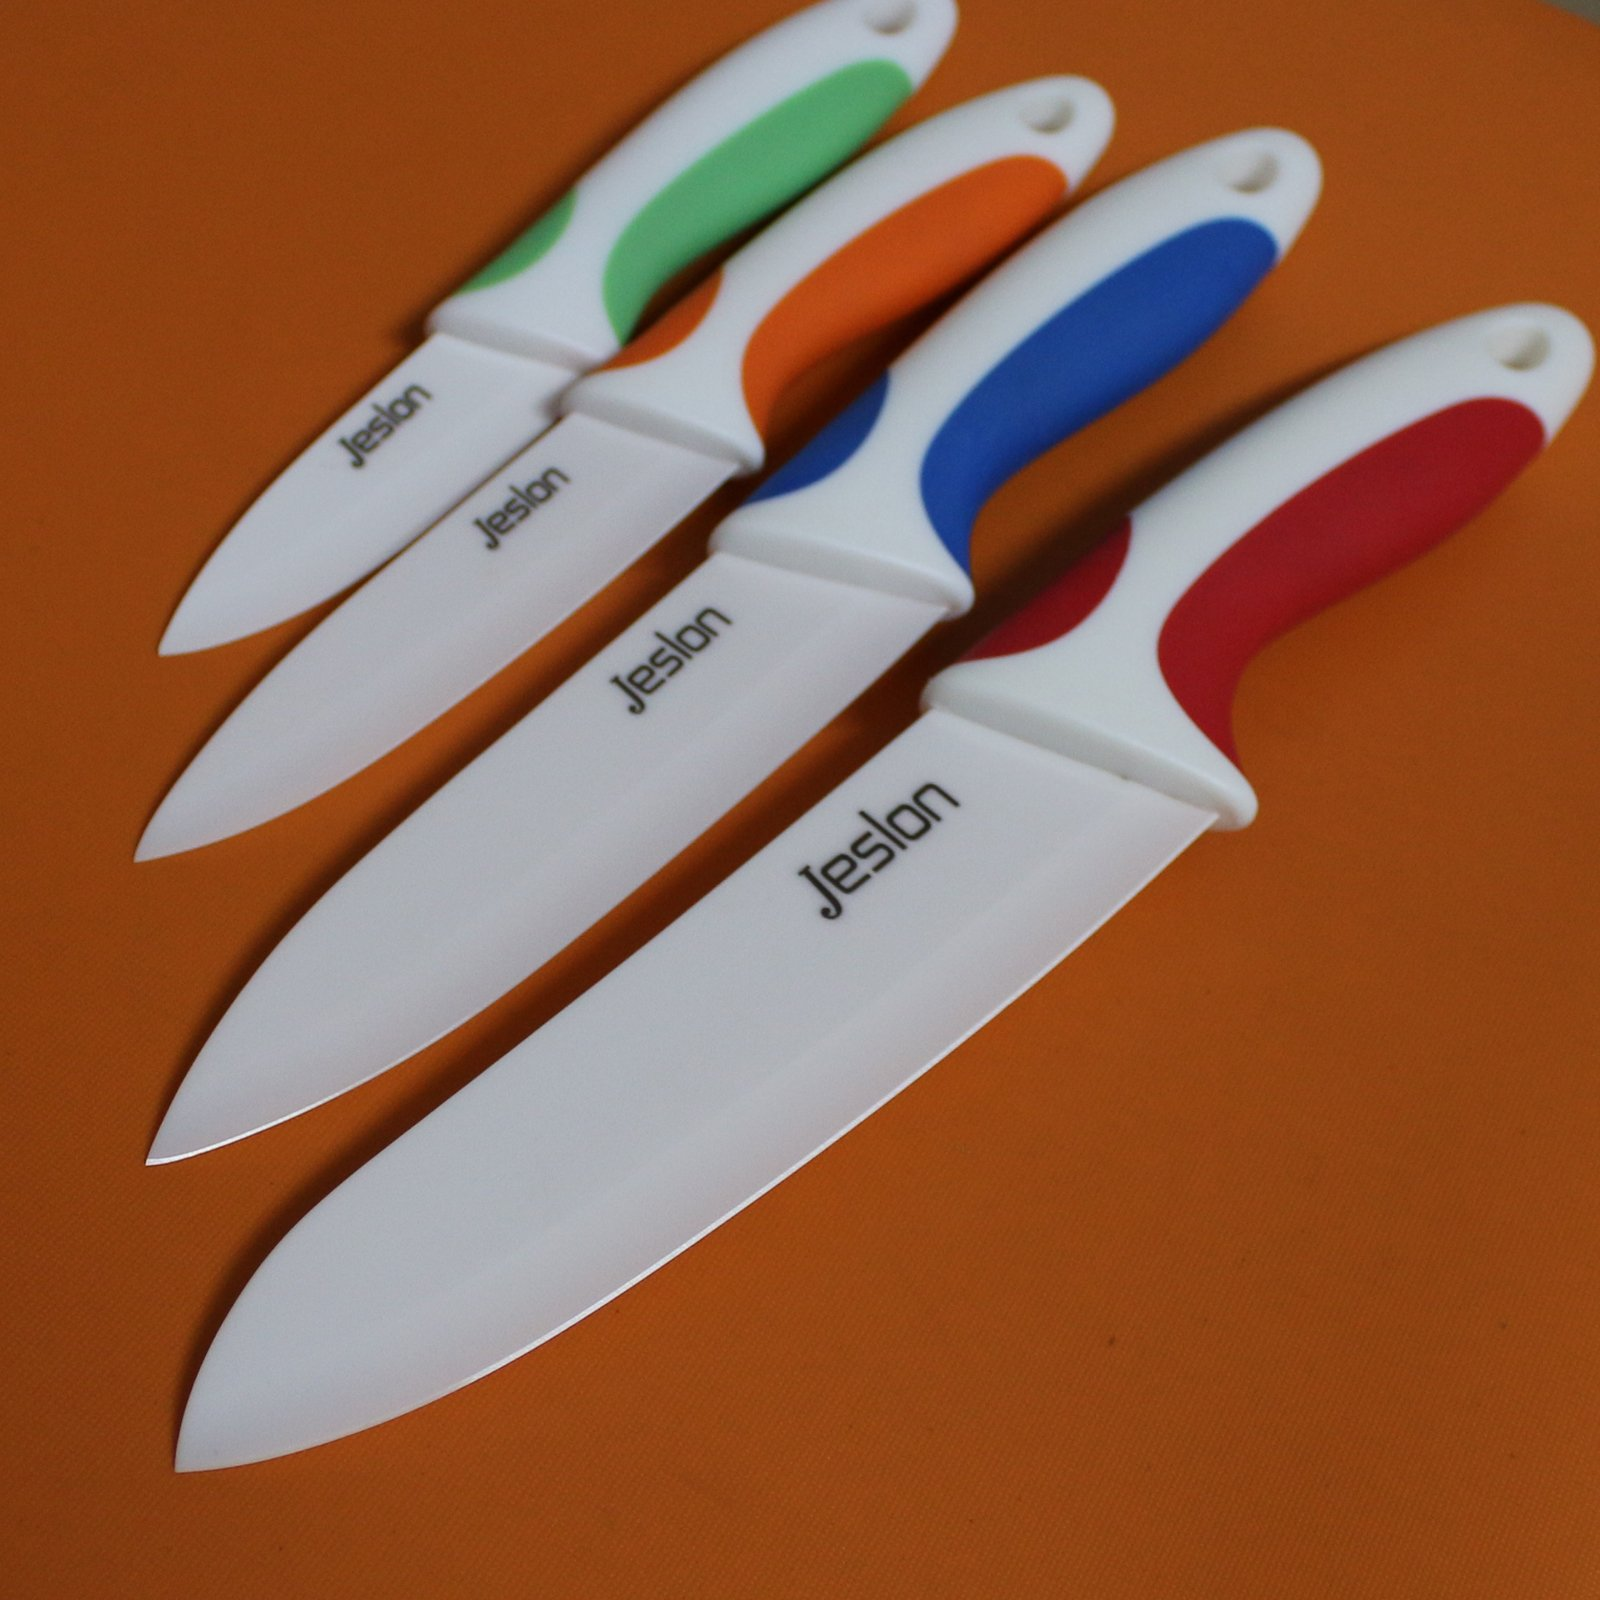 Jeslon Chef Knives Set, 4 Piece Multi Color Ceramic Knives, 3inch Paring Knife, 4inch Fruit Knife, 5inch Utility Knife, 6inch Chef Knife